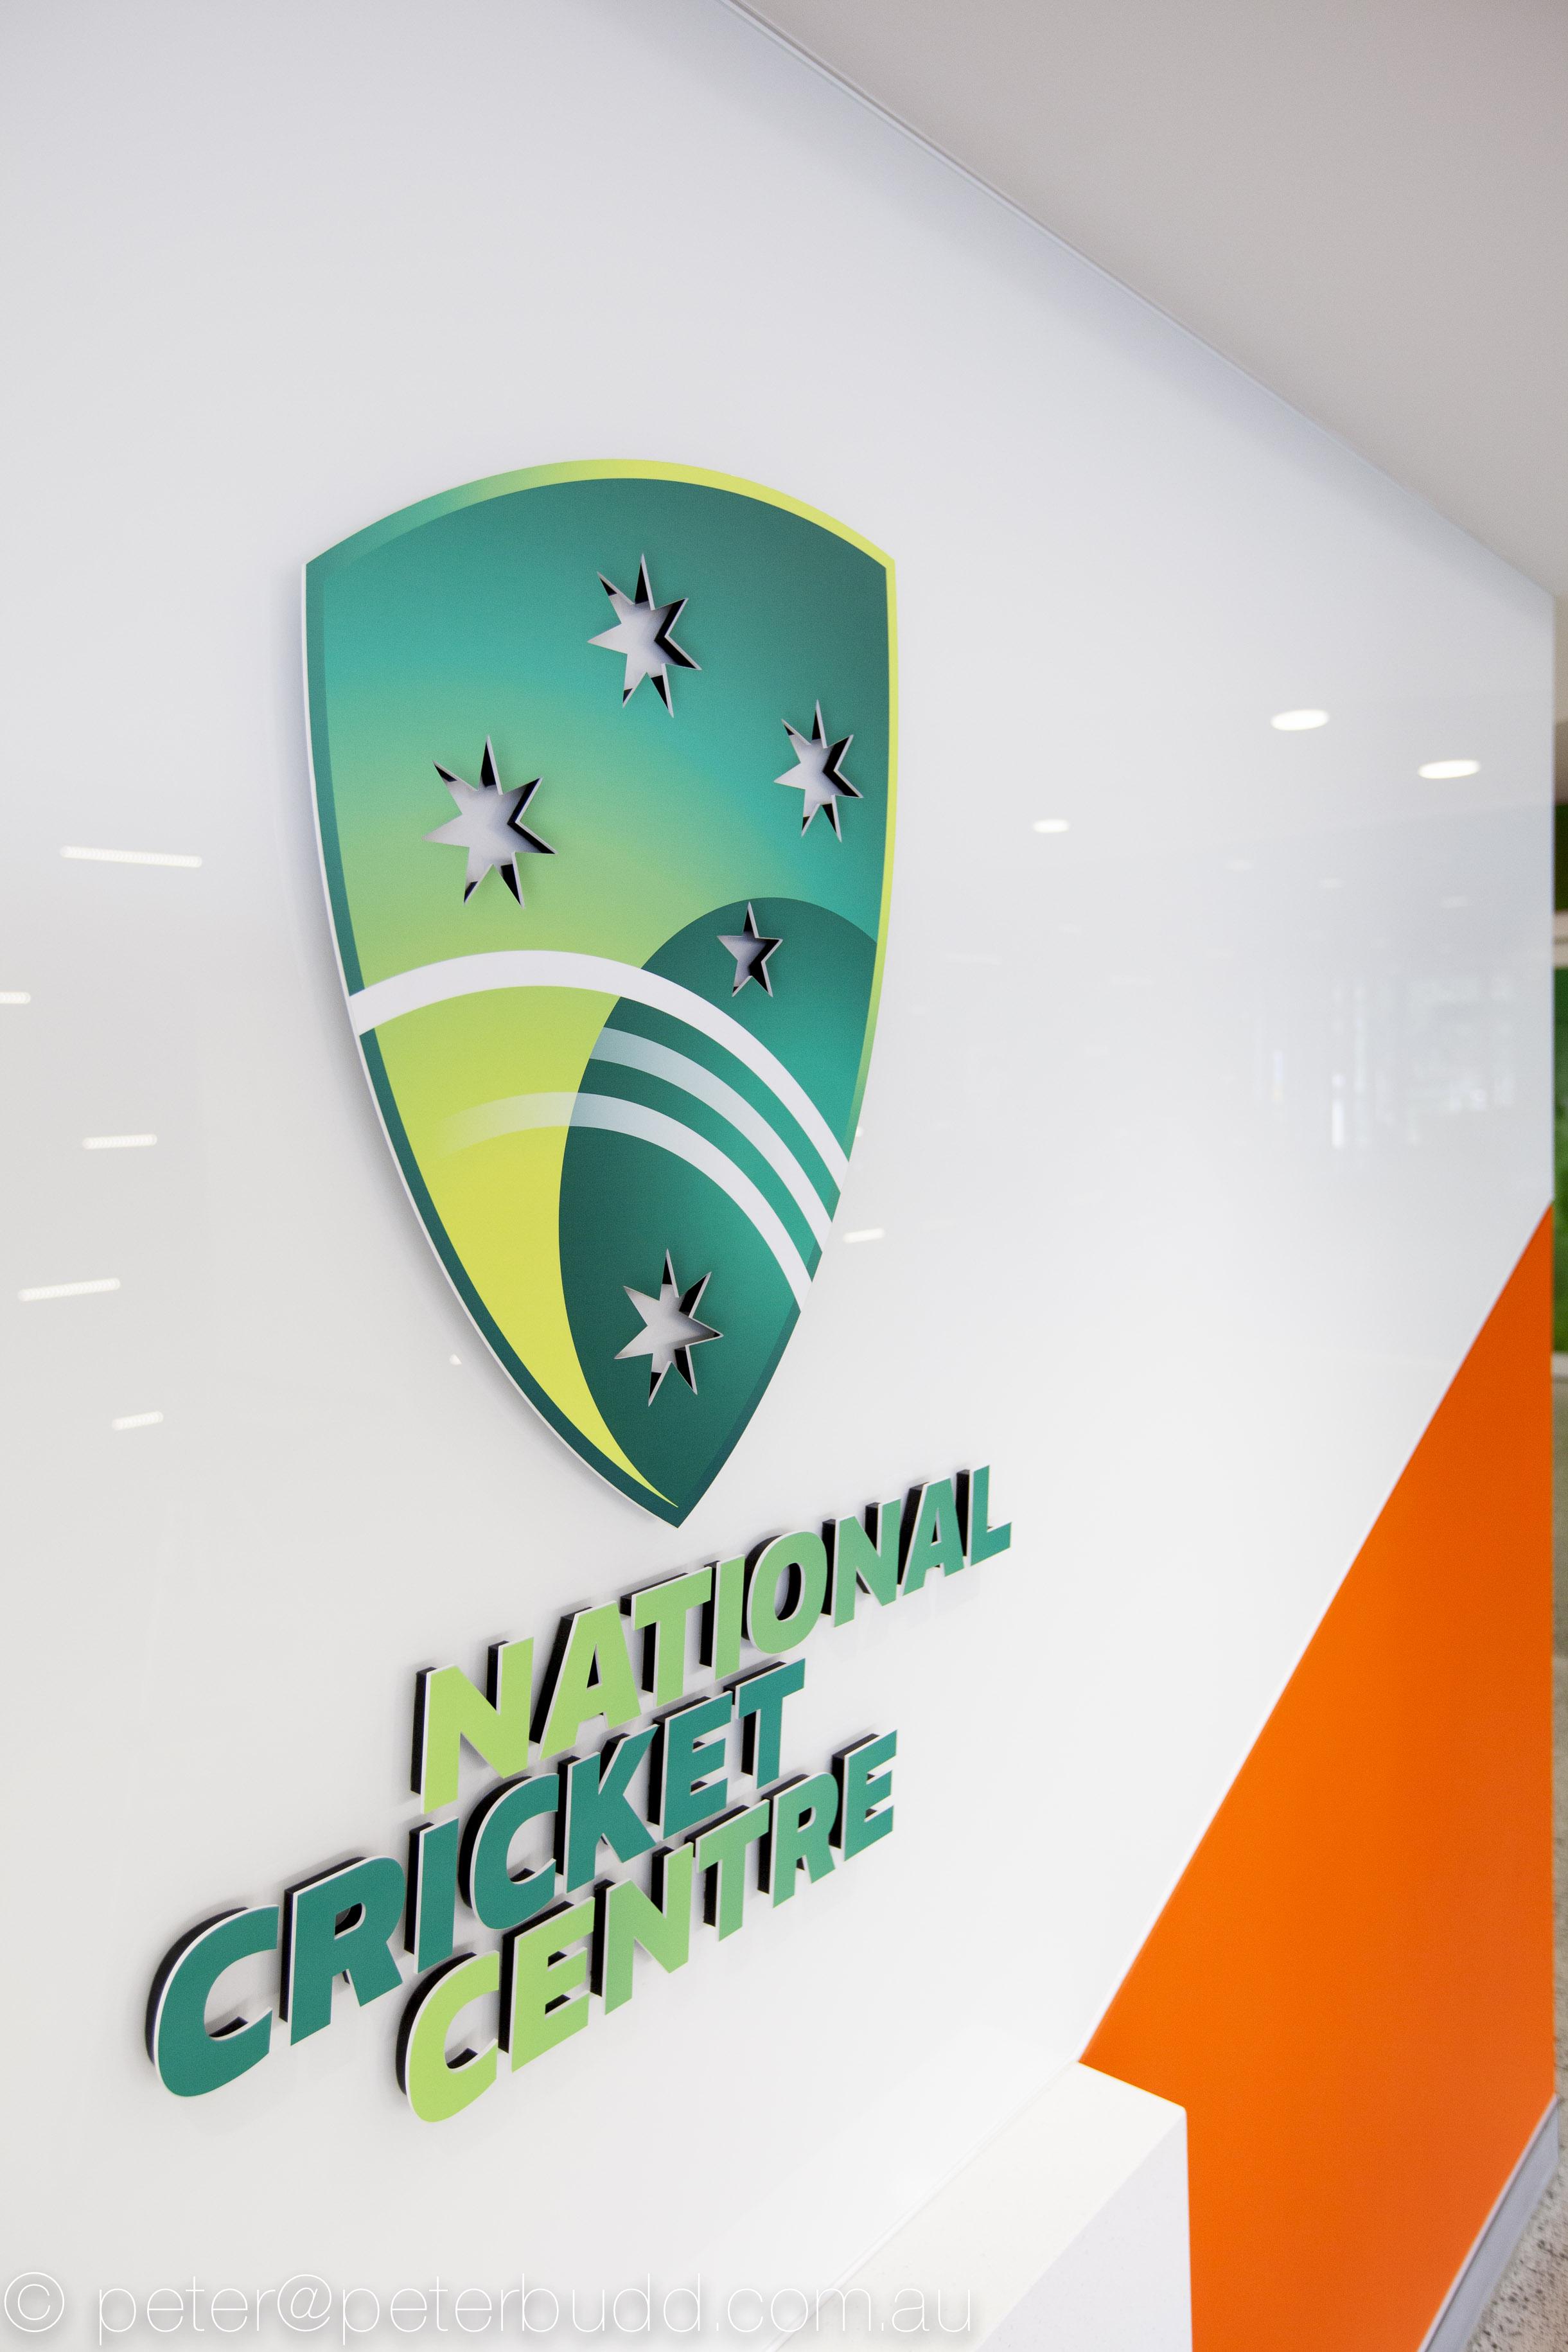 Private Certifiers Cricket Australia Pcg Portfolio Professional